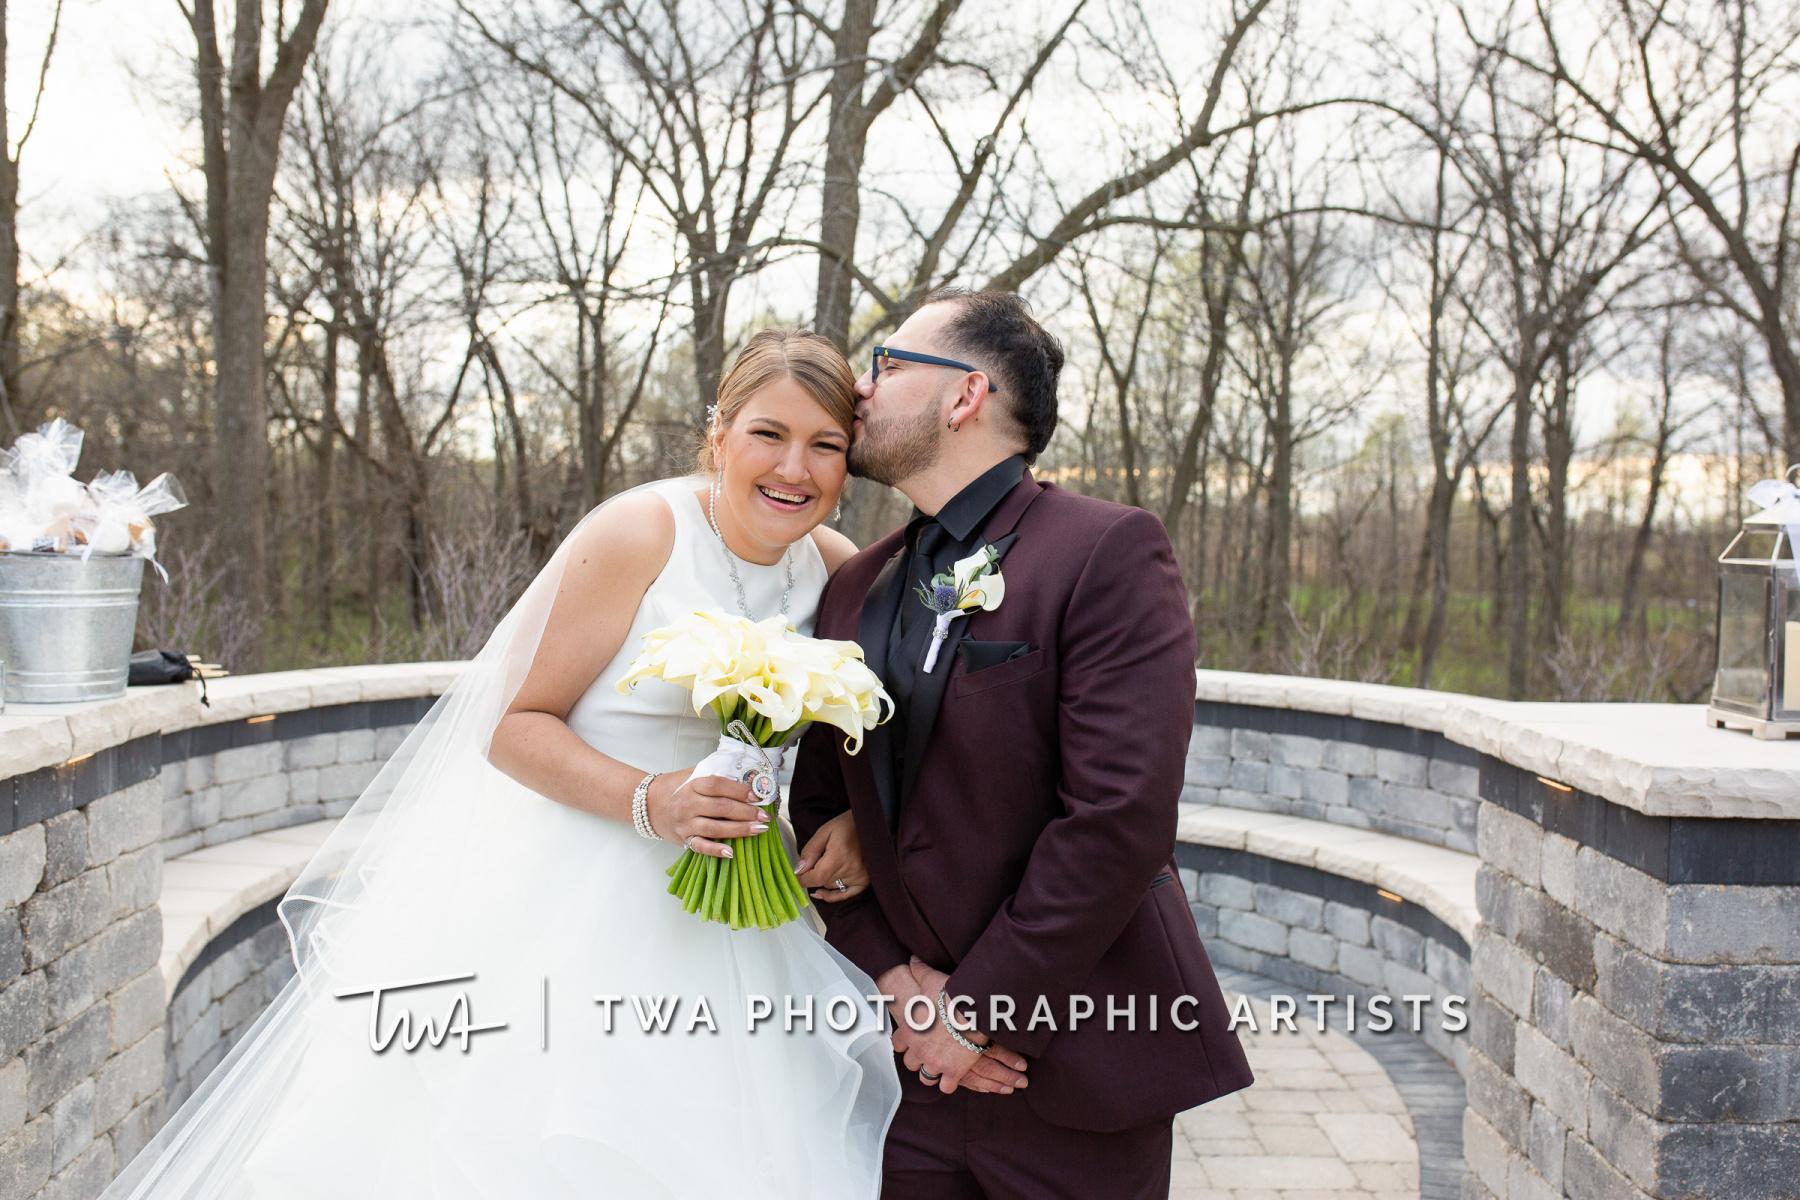 Chicago-Wedding-Photographers-Martini-Banquets_Borys_Caballero_MJ_SG-054-0396